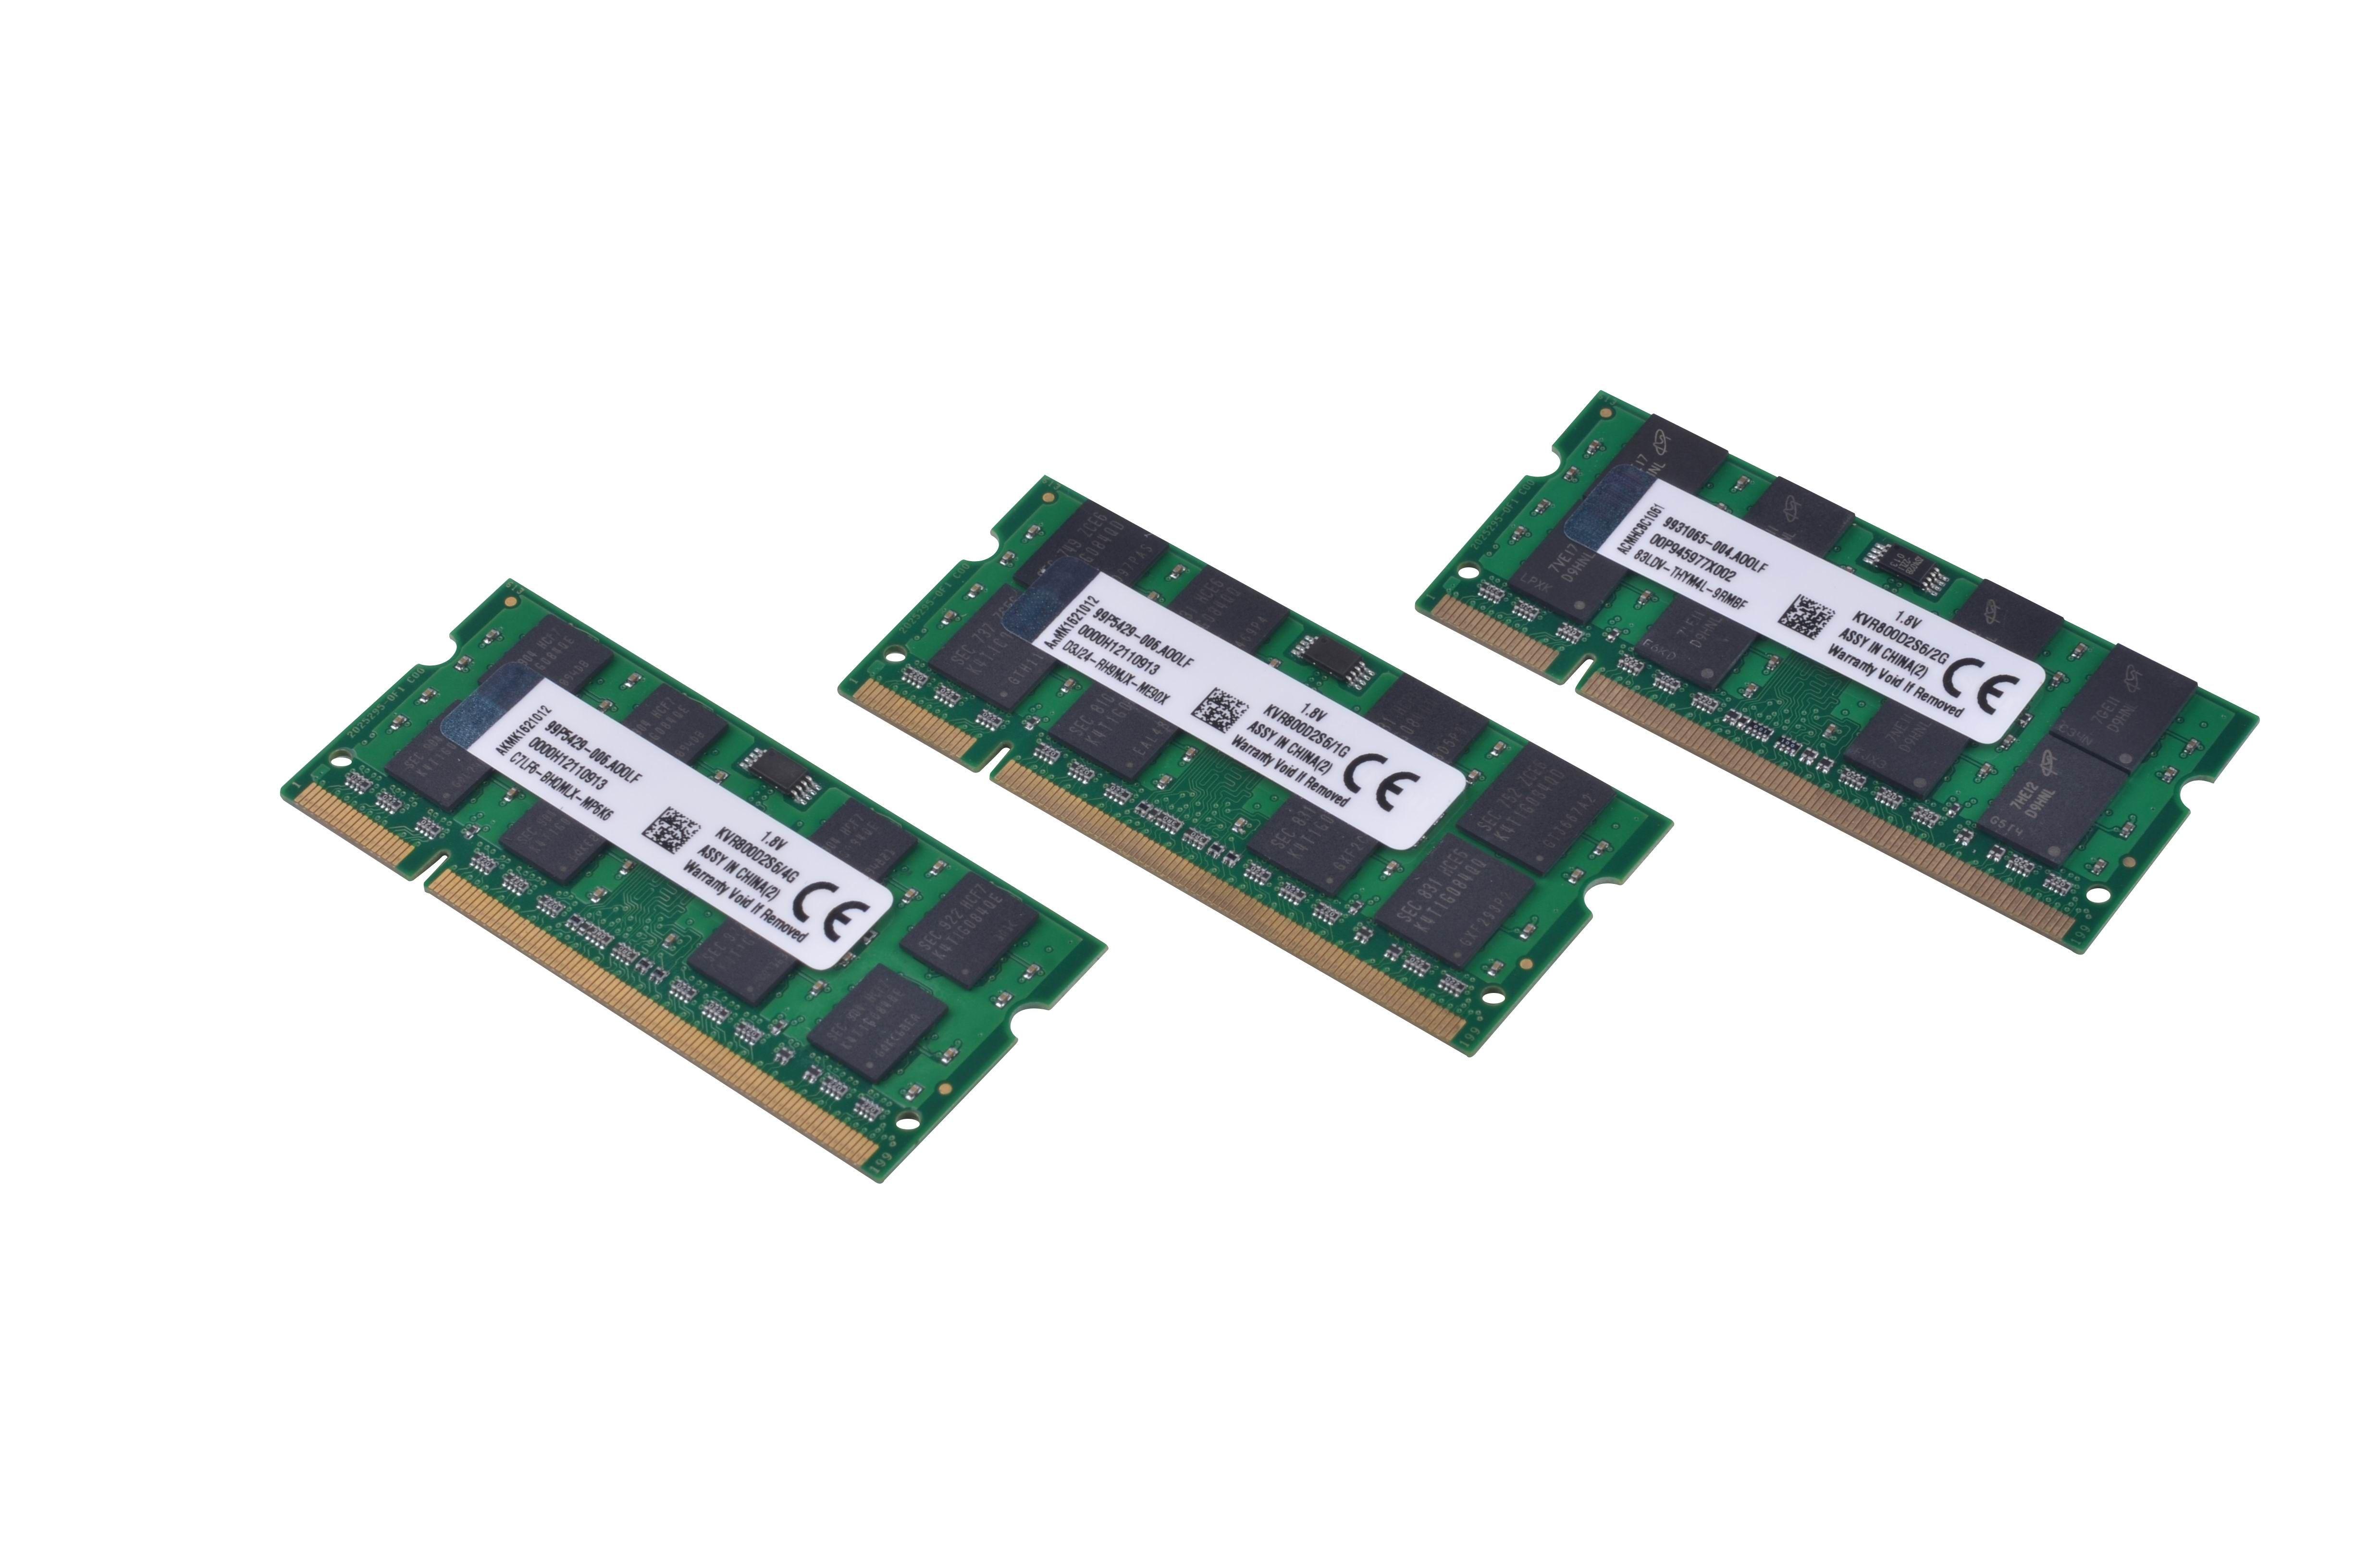 2018 New 1gb Pc2 6400 Ddr2 800 Mhz 200pin Sodimm Laptop Memory Ram 2gb Pc6400 200 Pin So Dimm Module From Kingmemorycompany 567 Dhgatecom